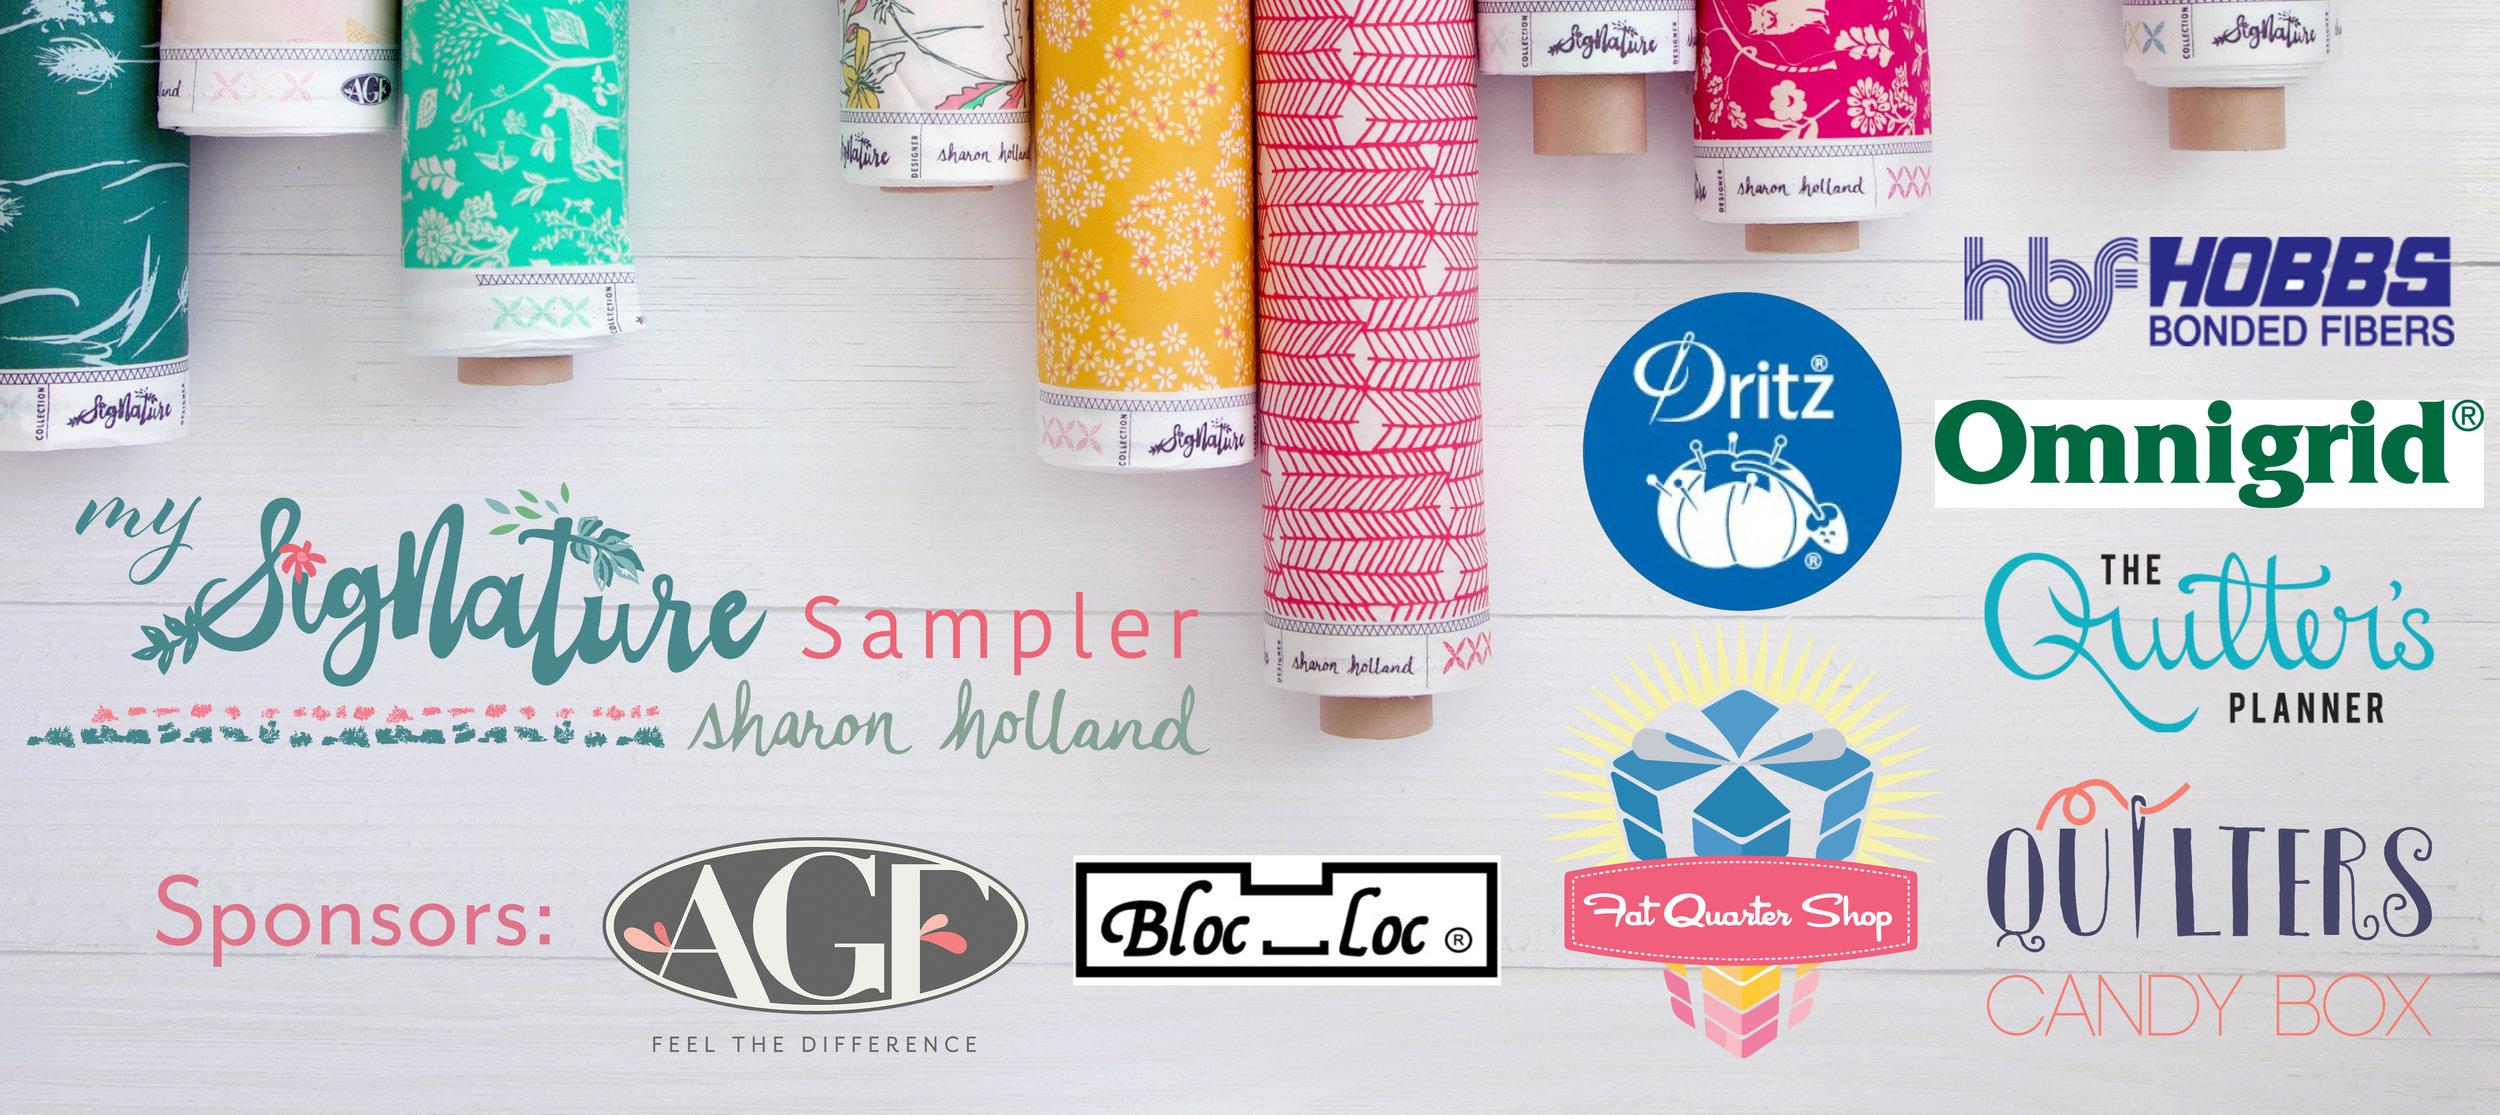 Art Gallery Fabrics | Hobbs Batting | The Quilter's Planner | Quilters Candy Box | Bloc_Loc |  Dritz  |  Omnigrid  |  Fat Quarter Shop